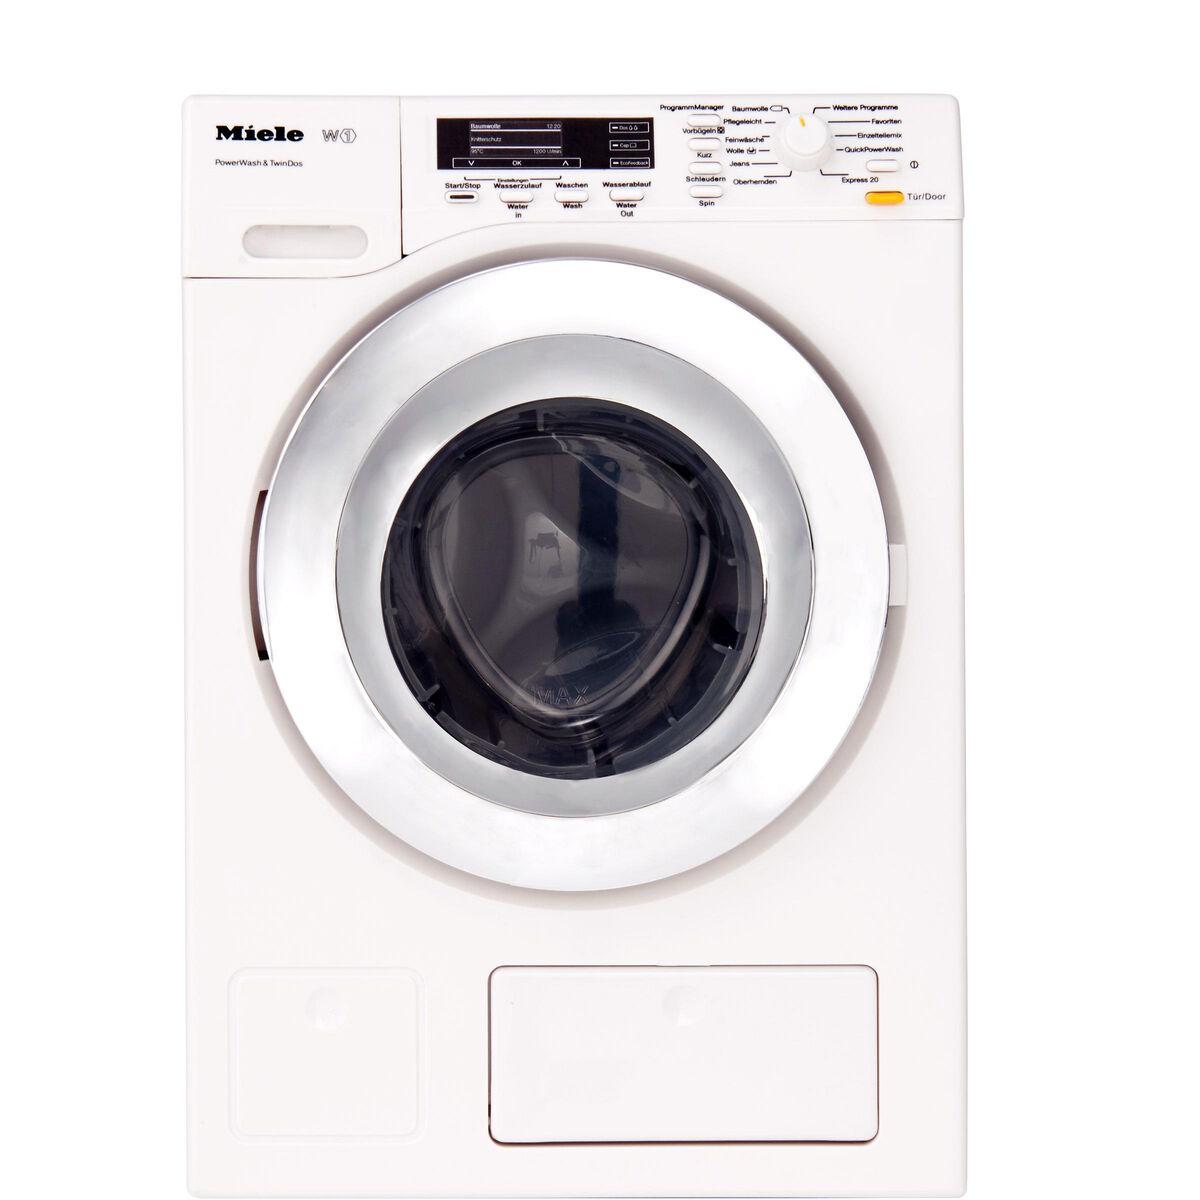 miele spielzeug waschmaschine butlers. Black Bedroom Furniture Sets. Home Design Ideas